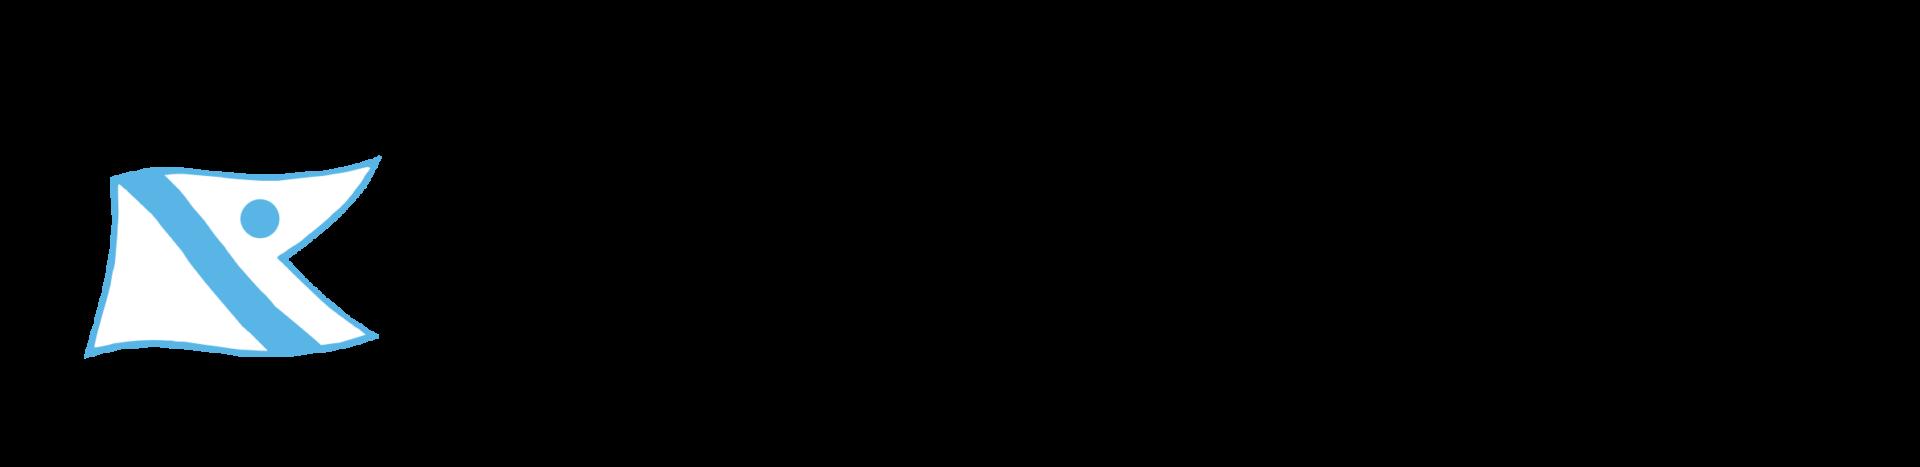 bonheur-logo2